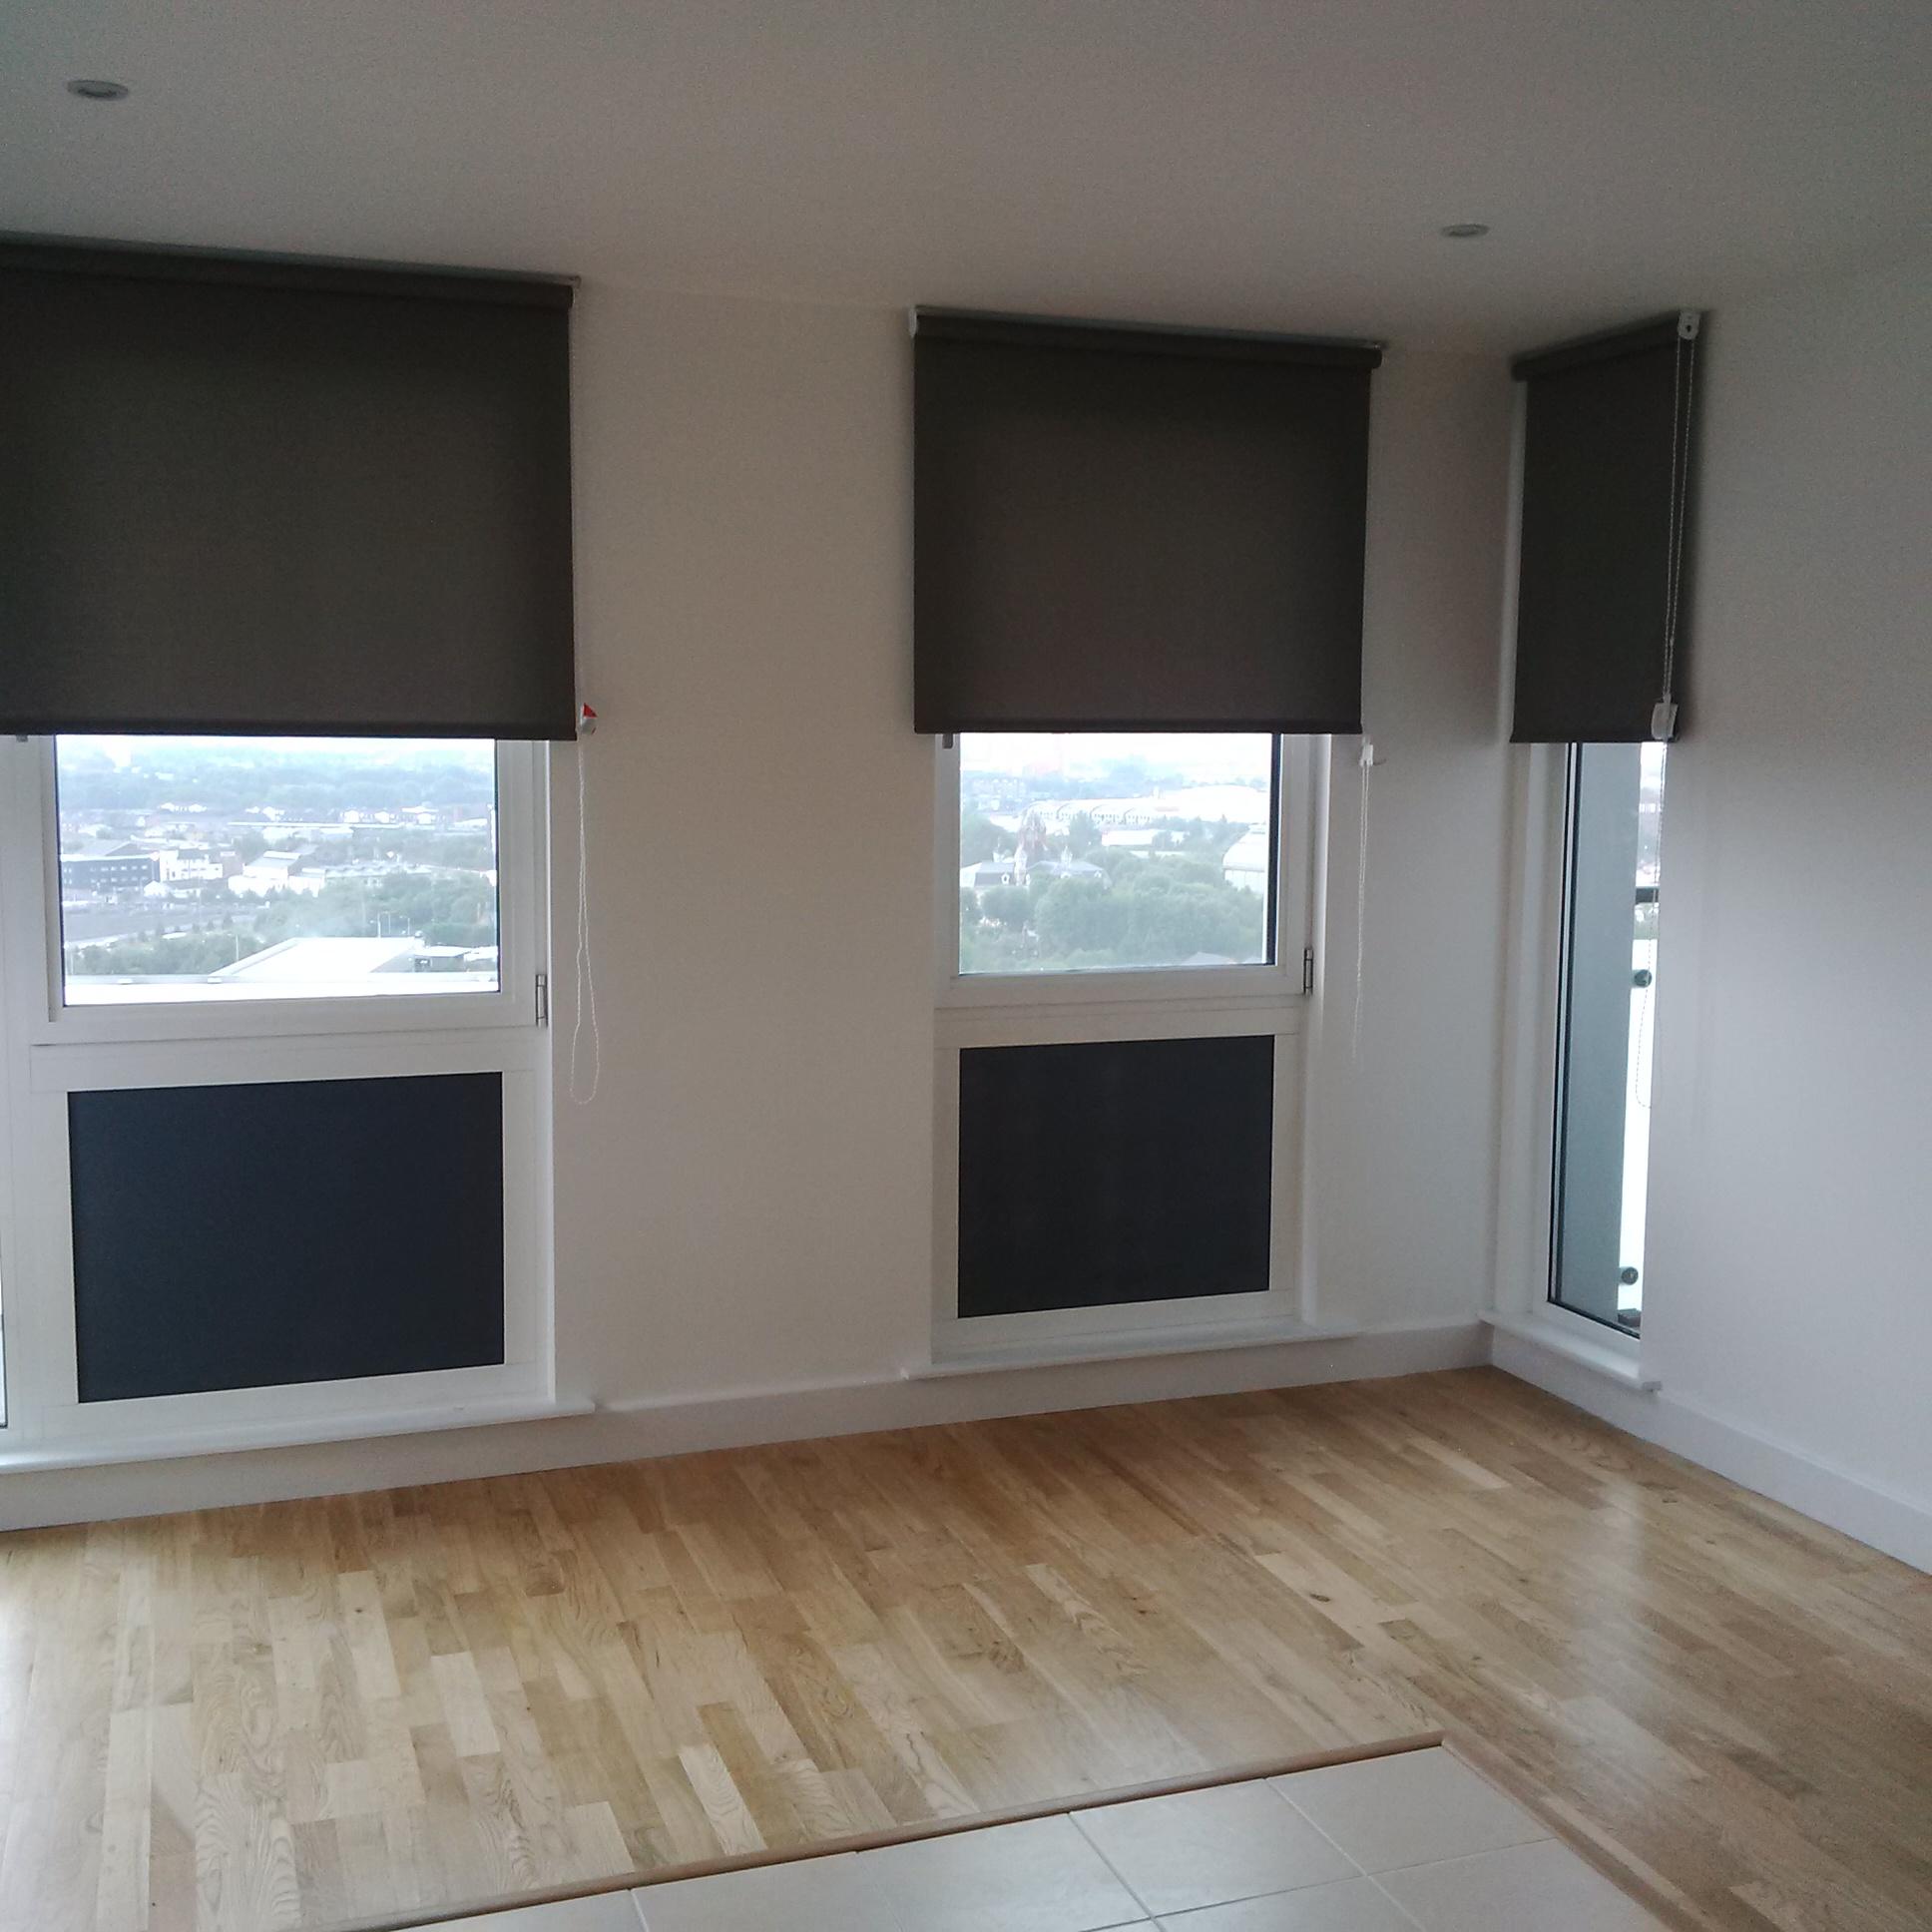 vertical blackout blinds images horizontal amp vertical blinds contract curtains amp blind supplied for large apartment